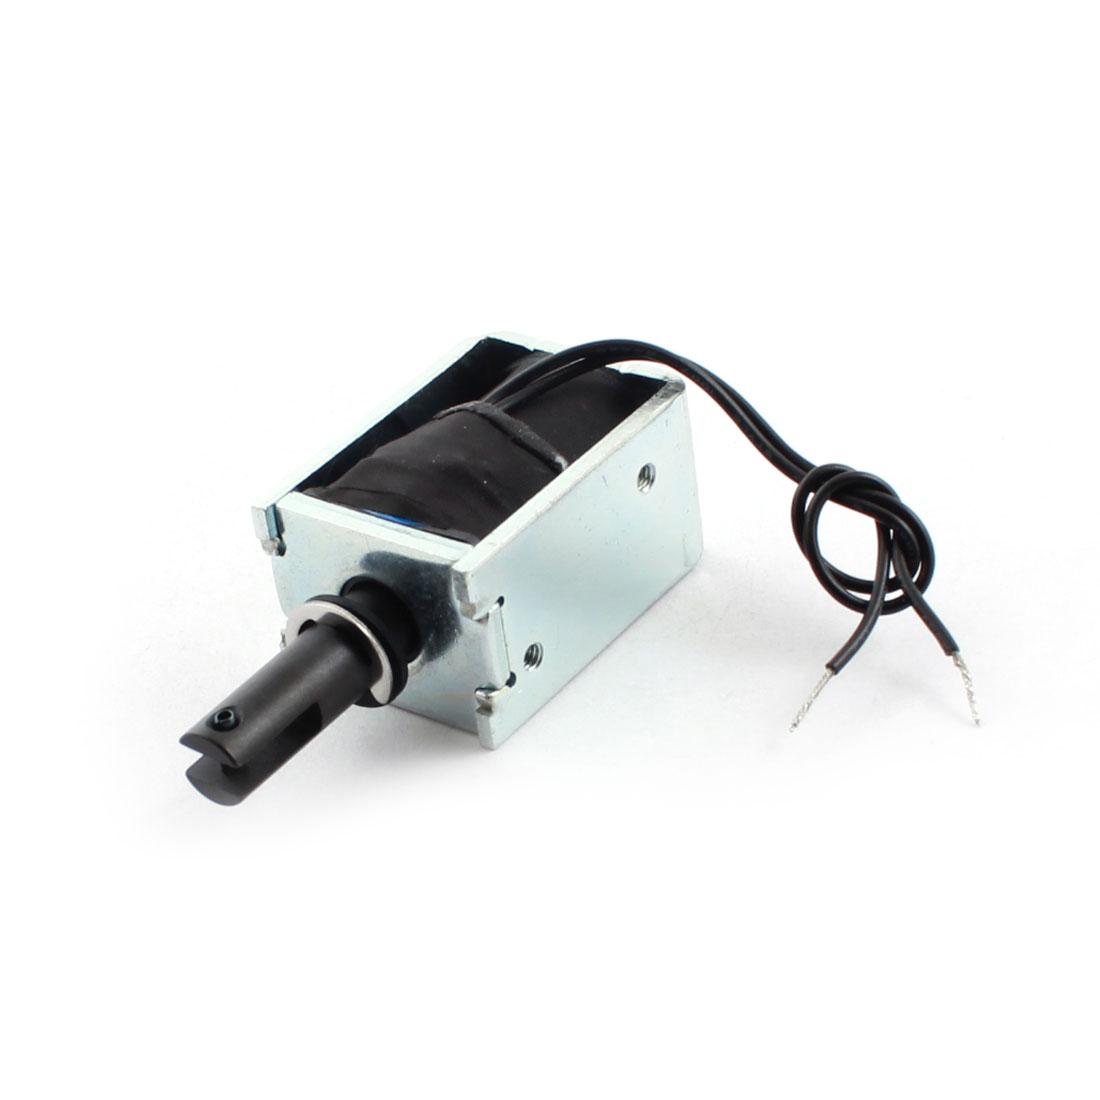 DC 6V 600g/5mm Open Frame Actuator Linear Pull Solenoid Electromagnet